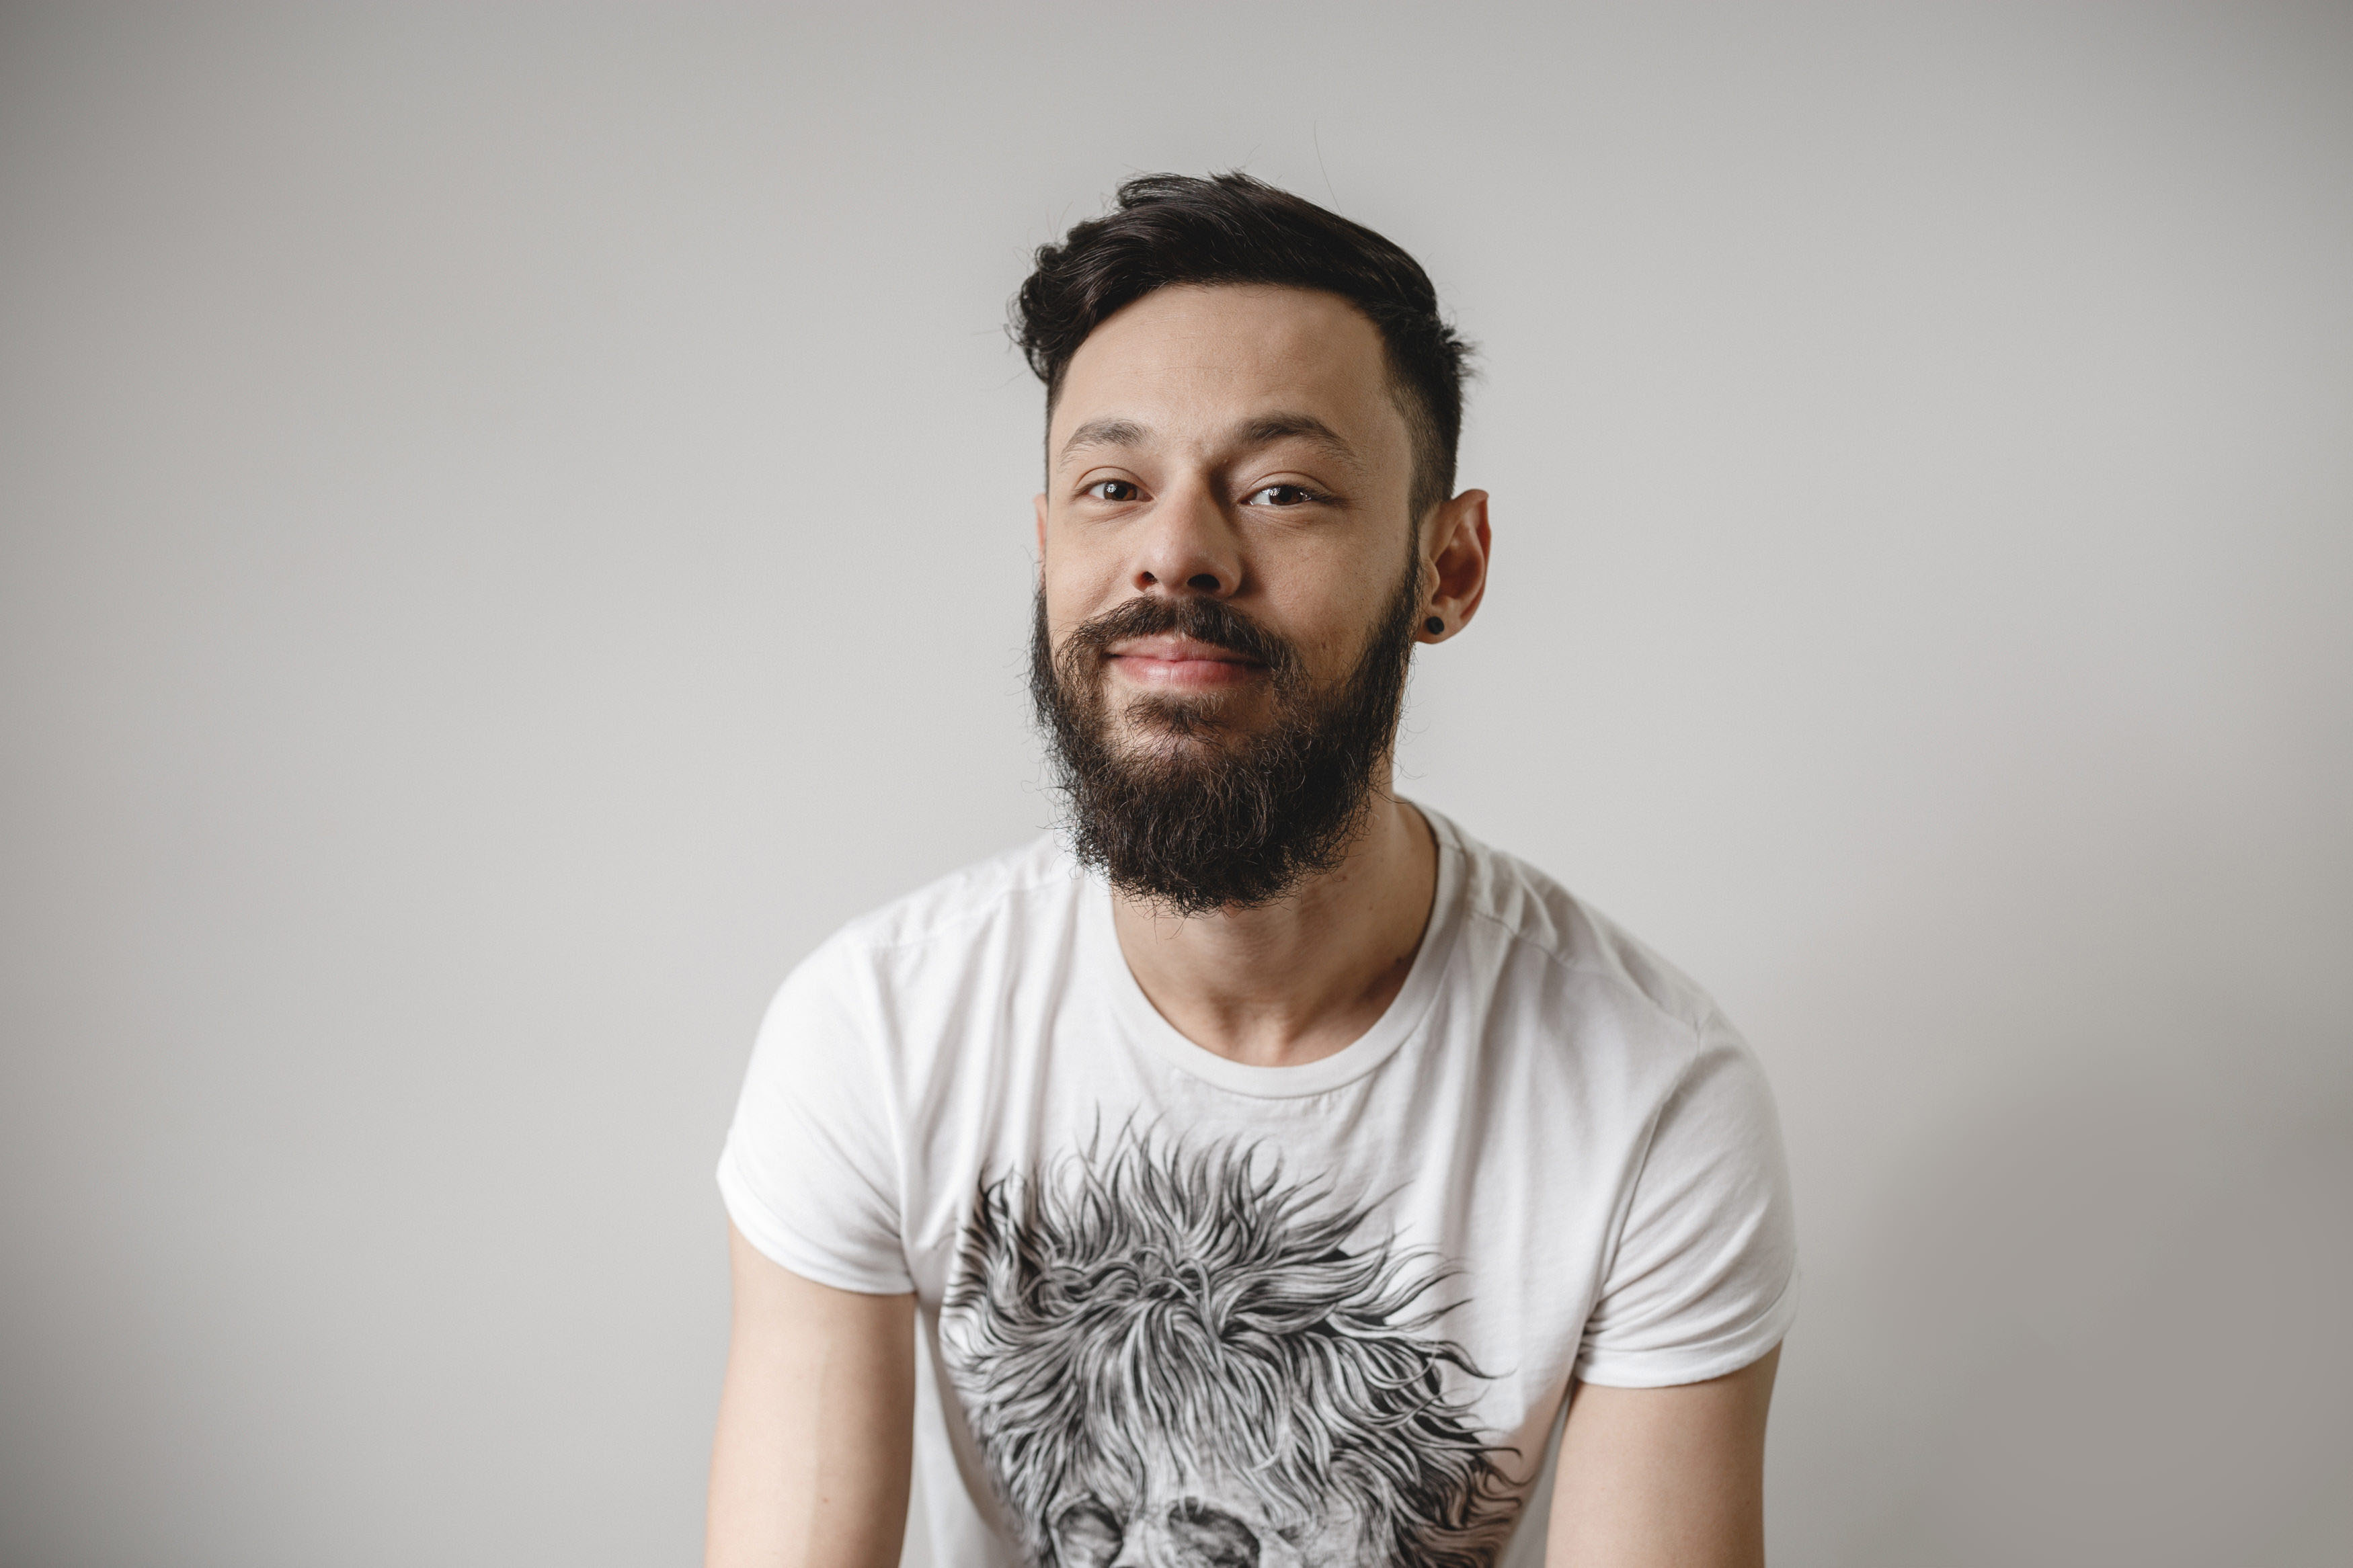 Nando Viana se apresenta no Risorama Londrina